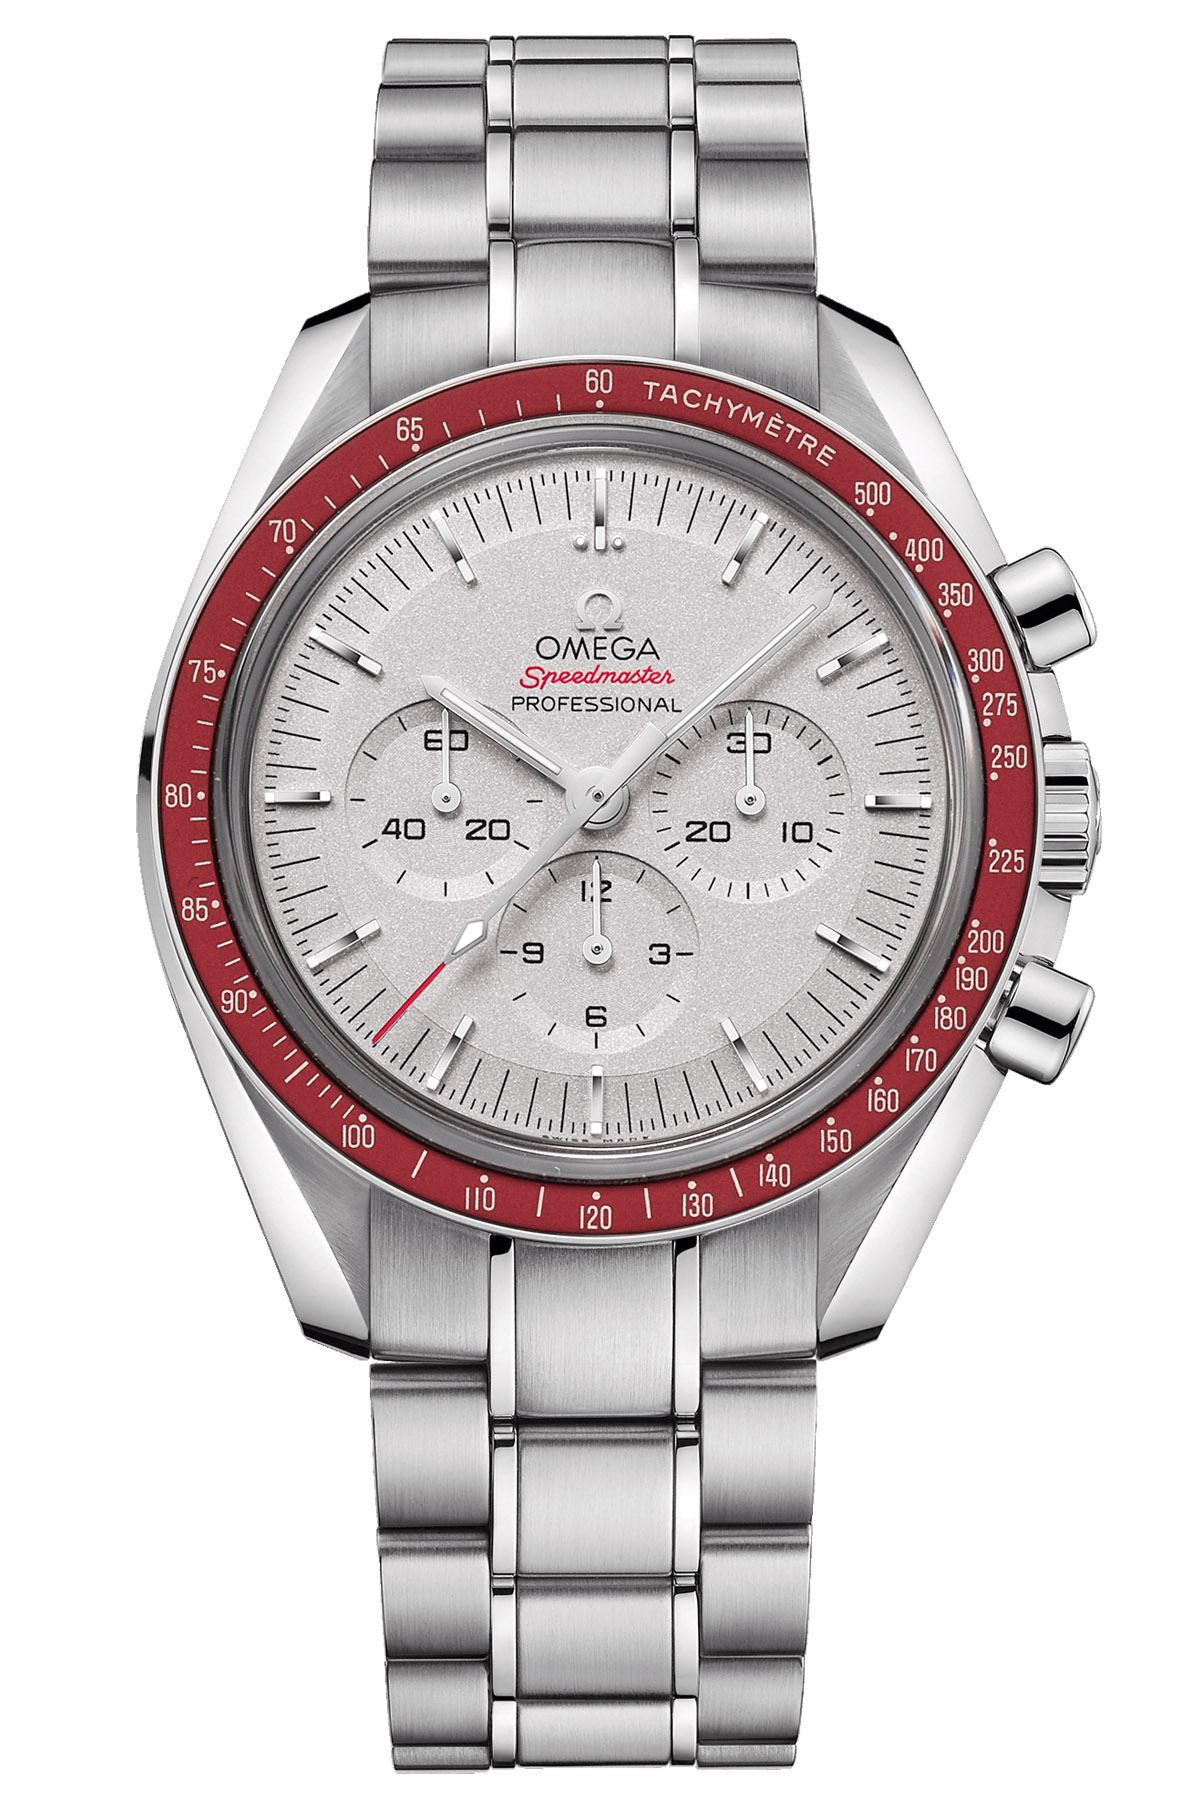 Omega Speedmaster Tokyo 2020 Olympics collection 52230423006001